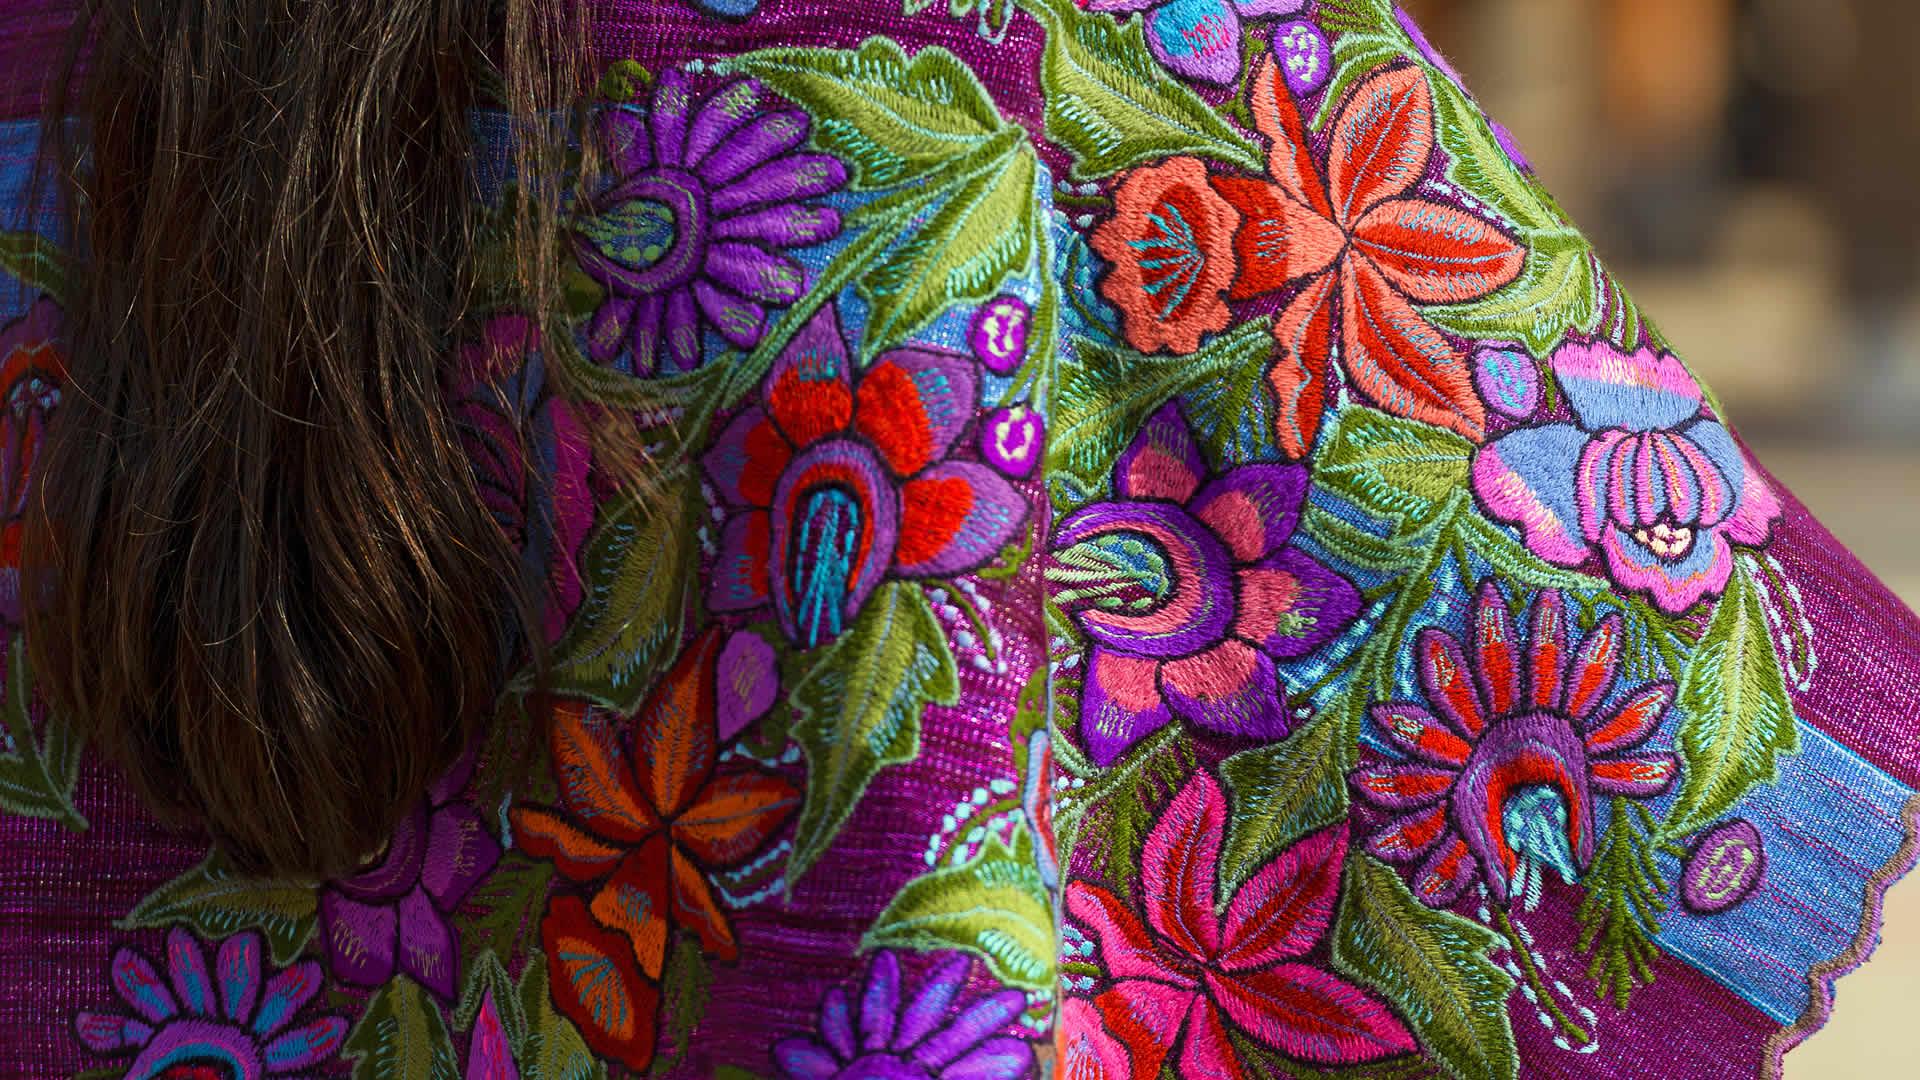 Vestimenta típica de Chiapas, México